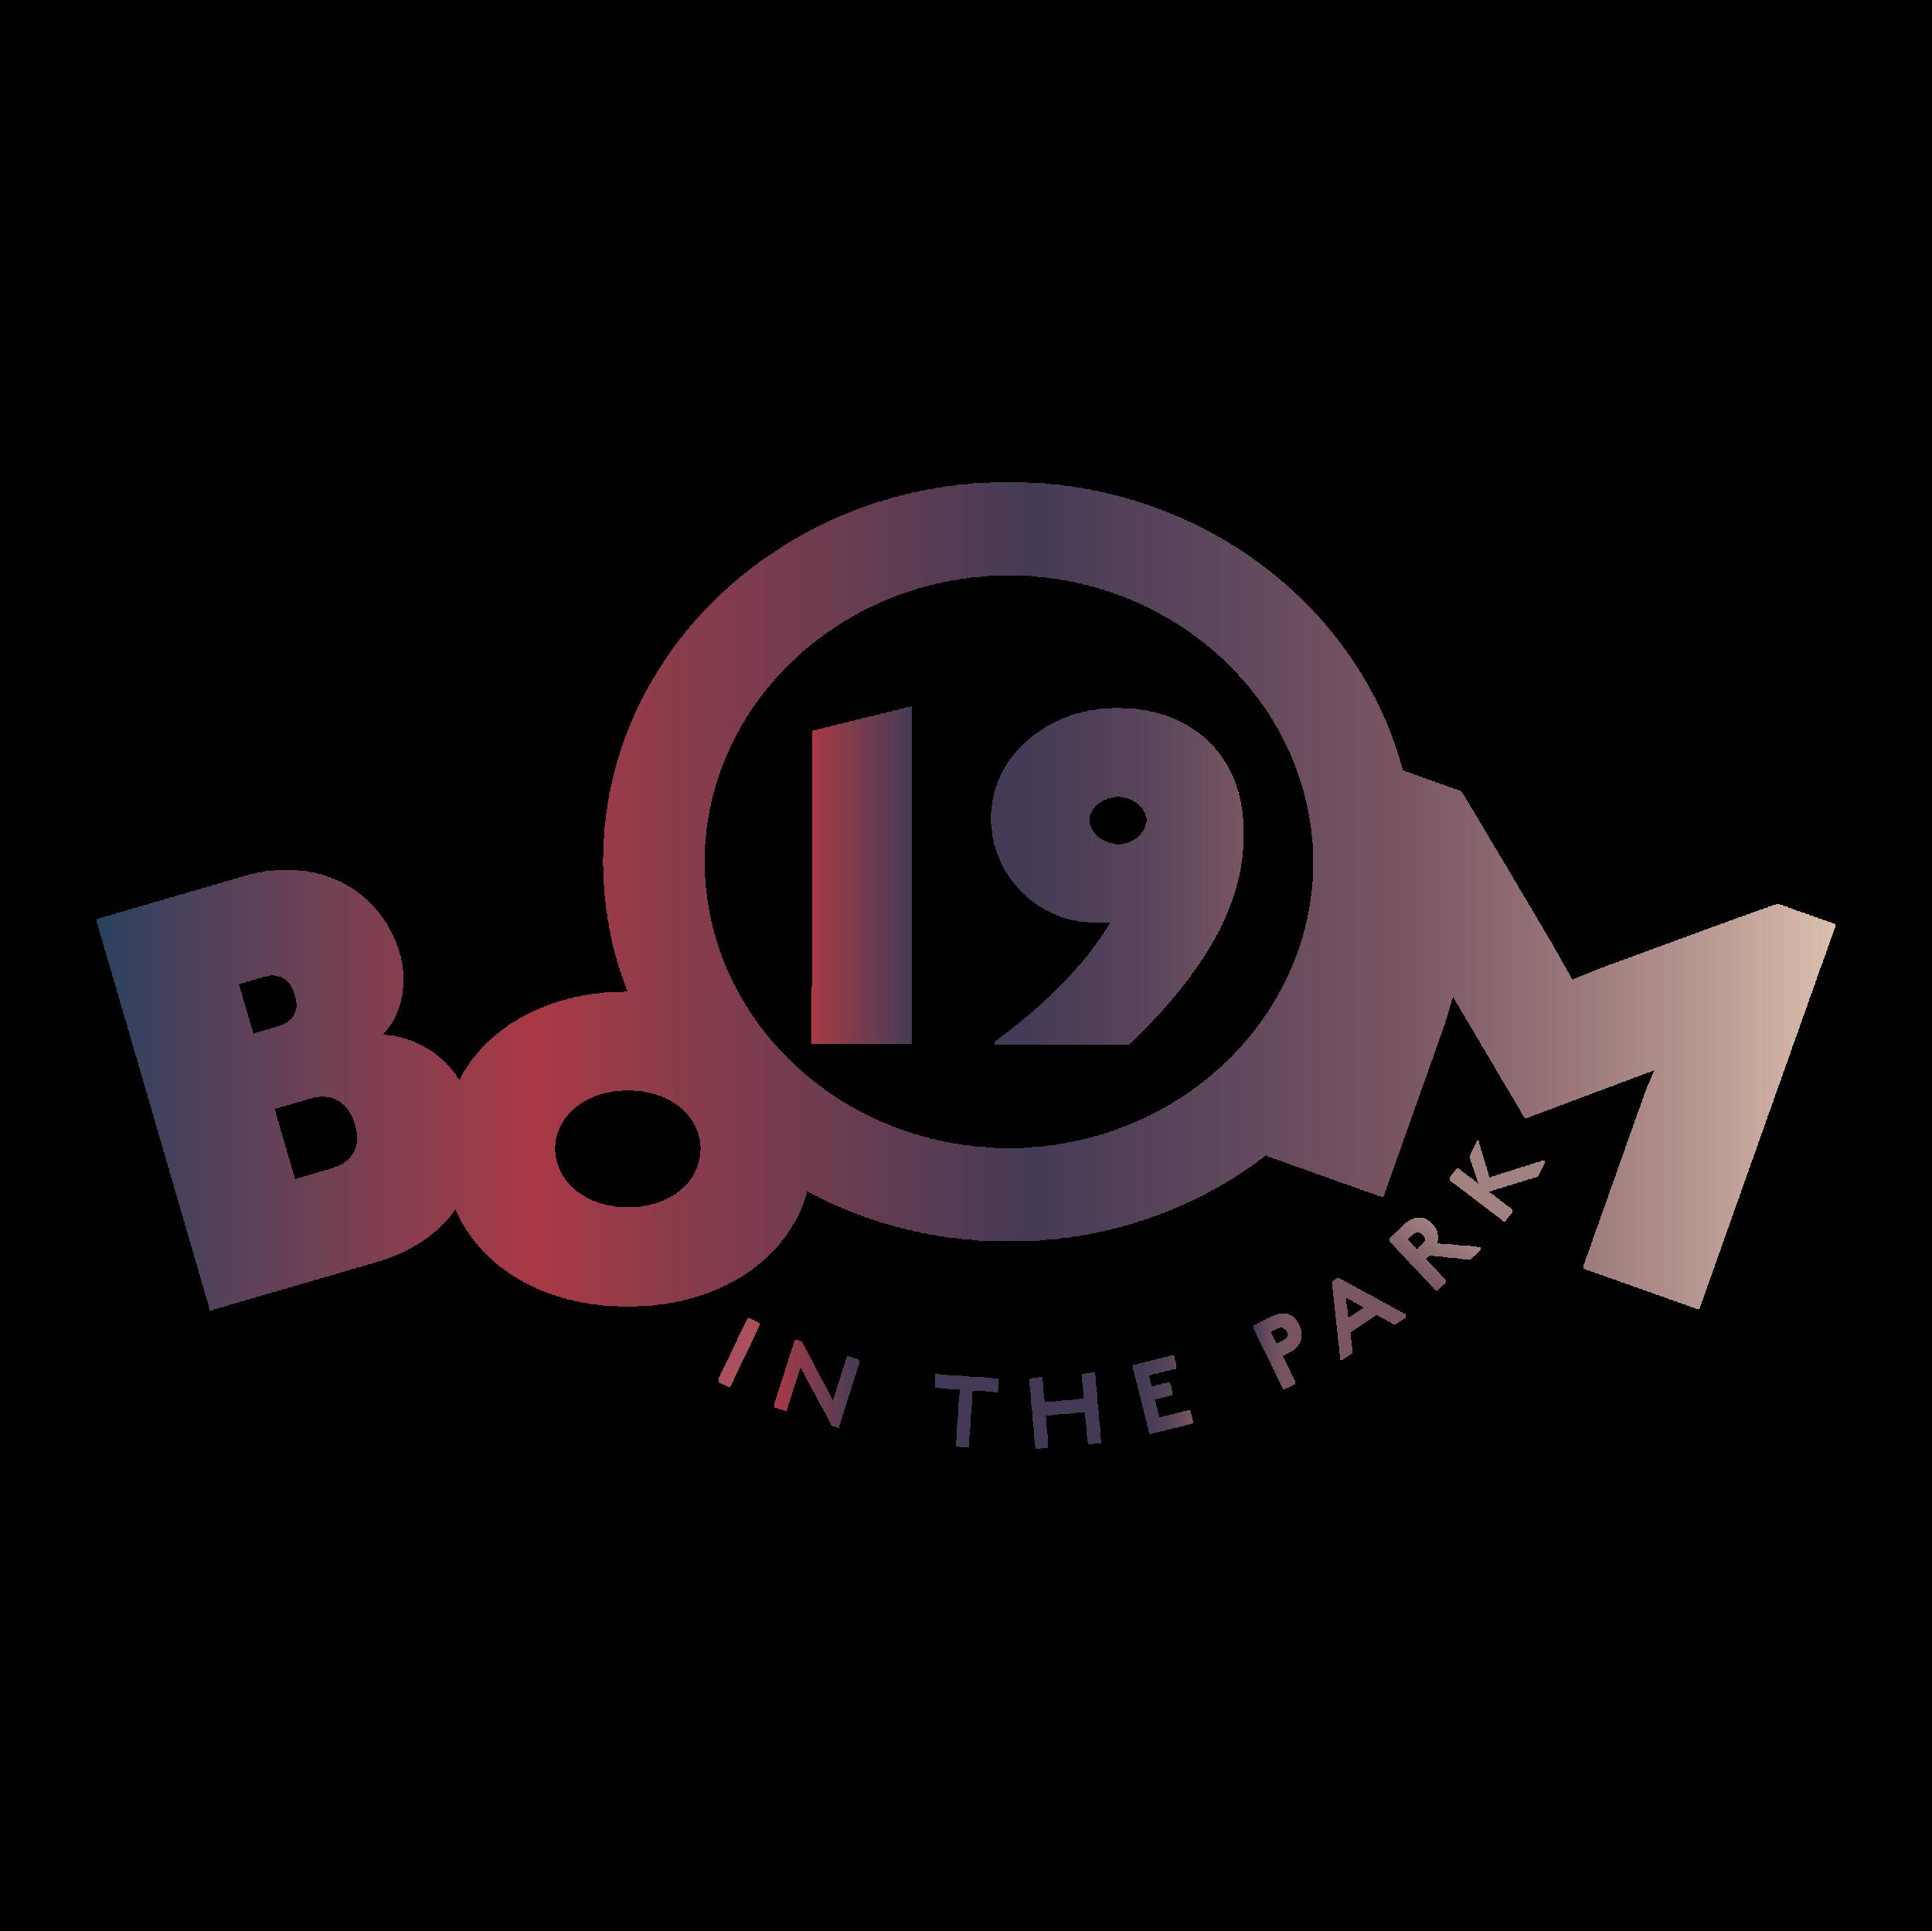 boom logo 19-02.png